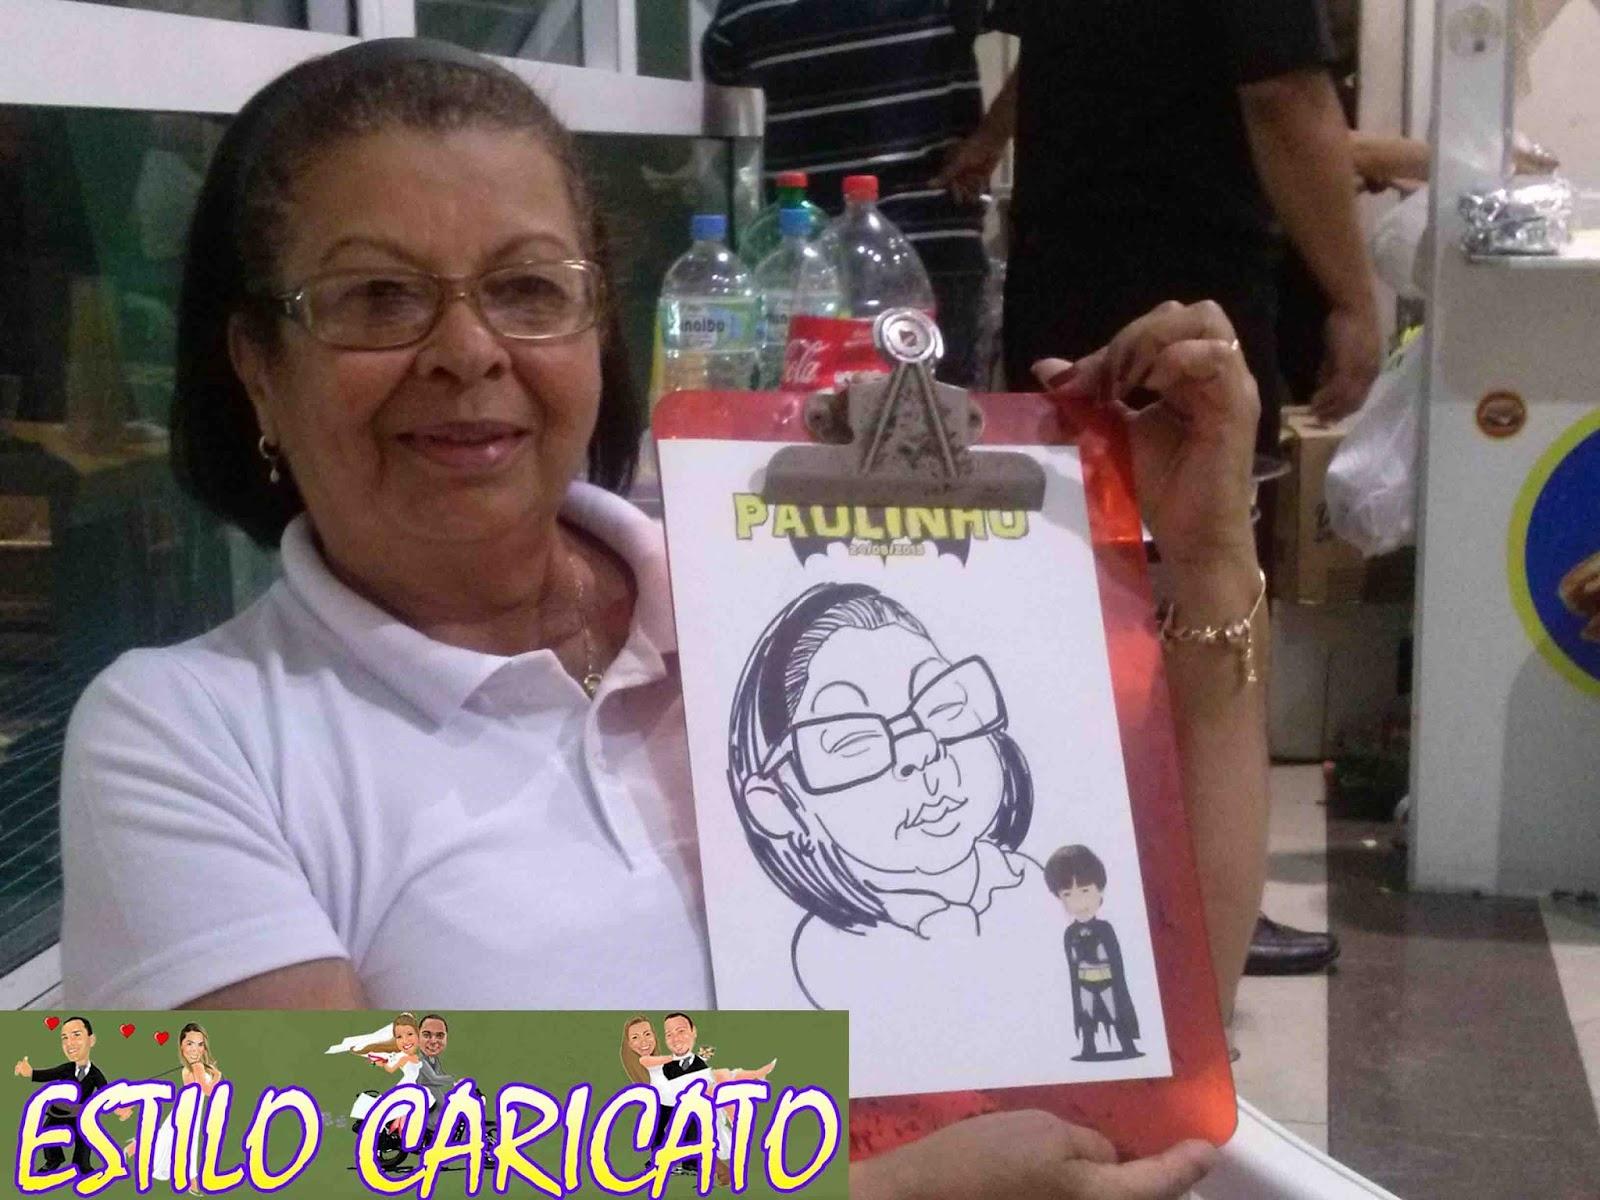 caricatura ao vivo,caricaturista